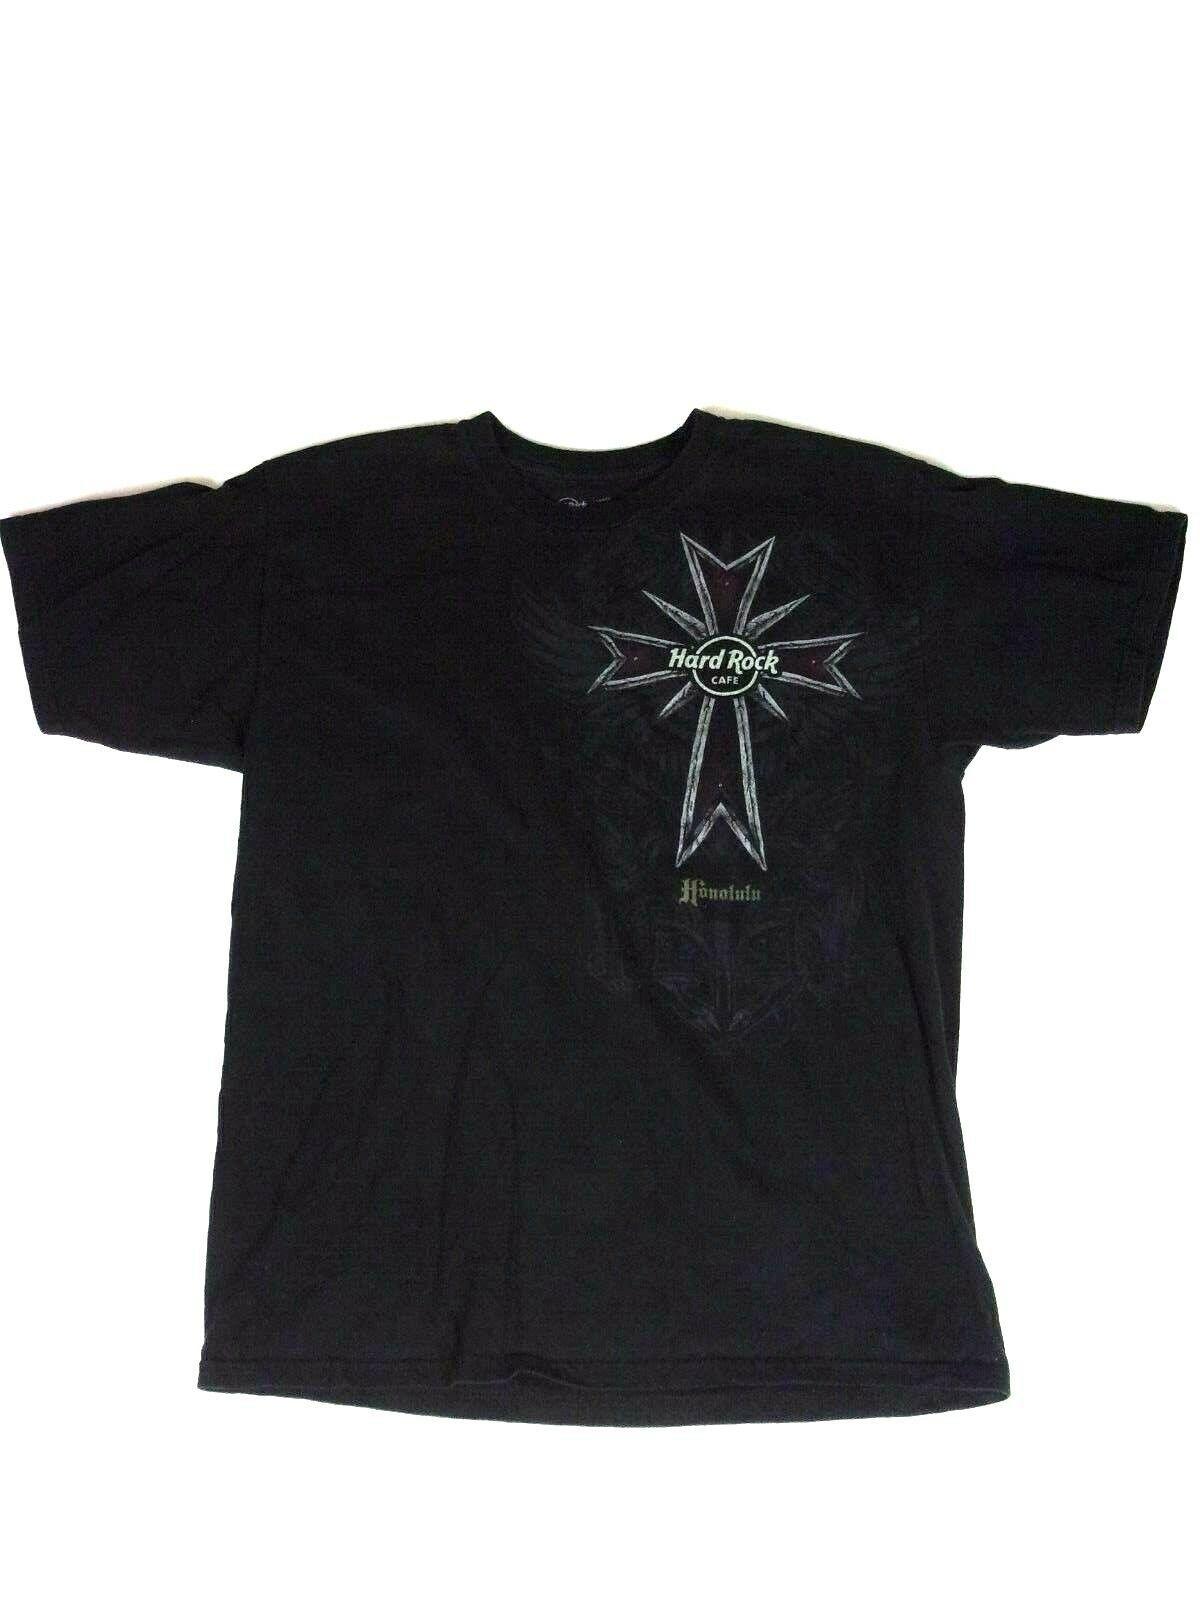 144c59ca VTG Hard Rock Cafe Honolulu Hawaii Guitar Skulls Mens Black Tee Shirt Size  L - $23.34